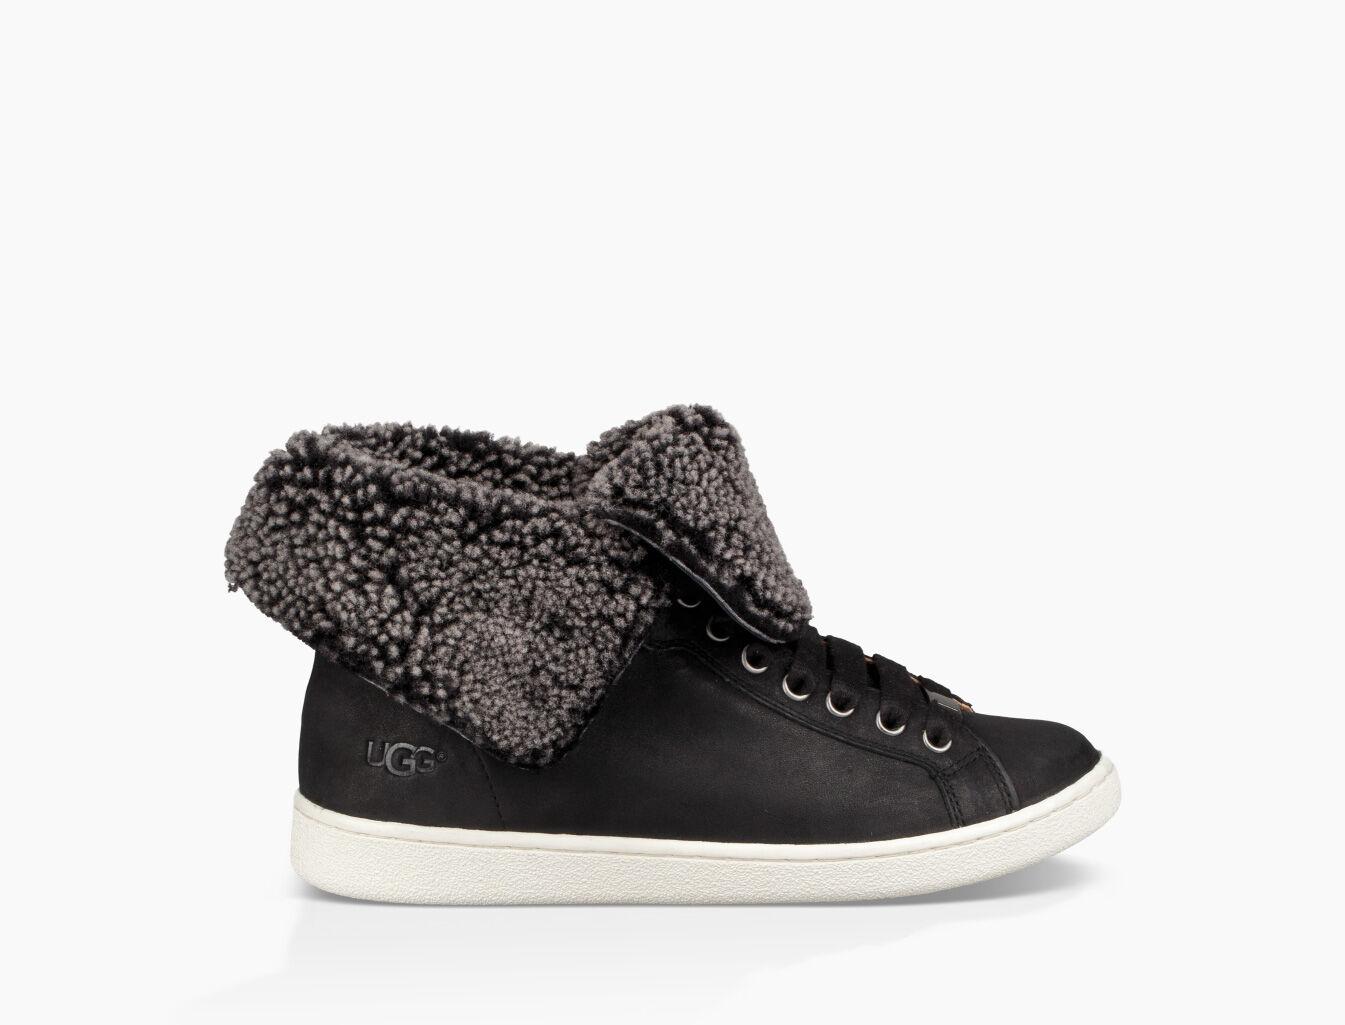 Zoom Starlyn Sneaker - Image 1 of 6